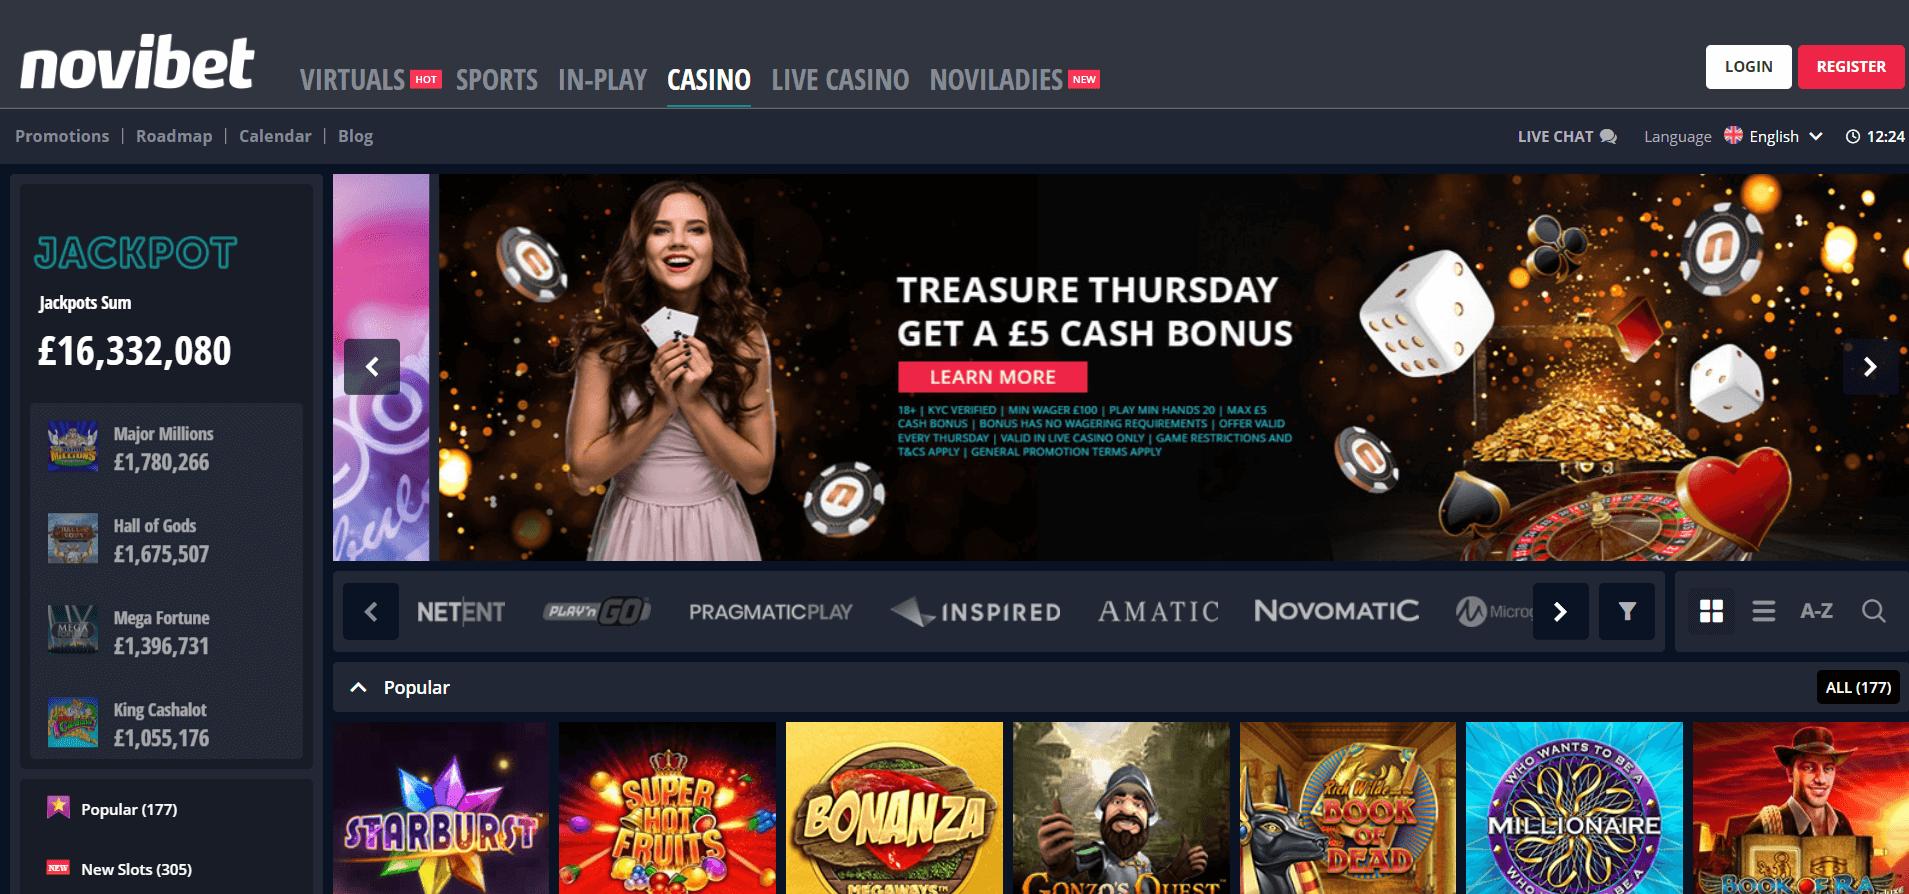 Novibet Casino Homepage